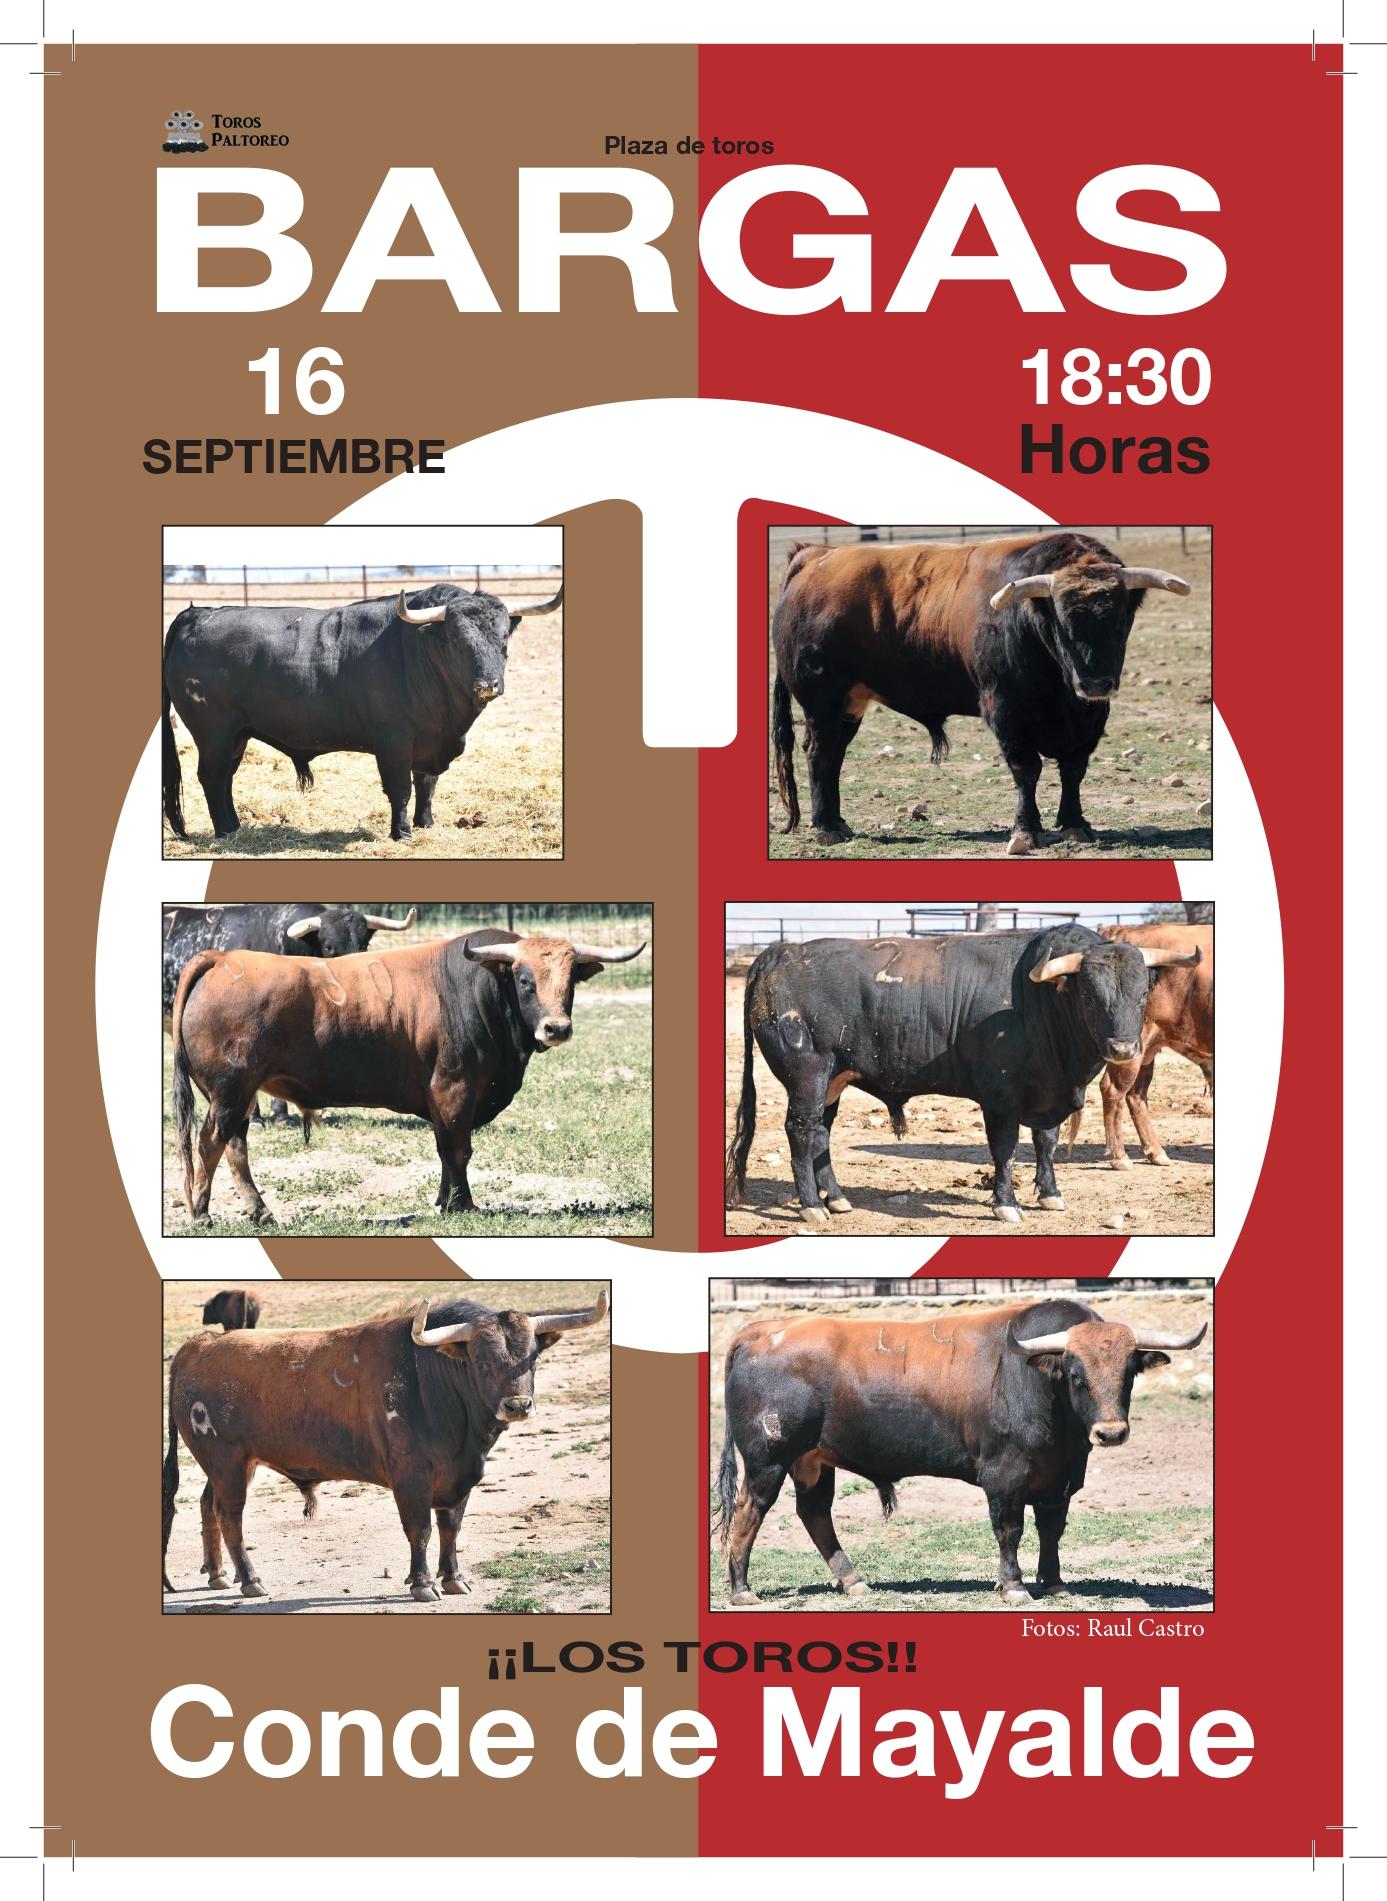 TOROS BARGAS A4 revista toros